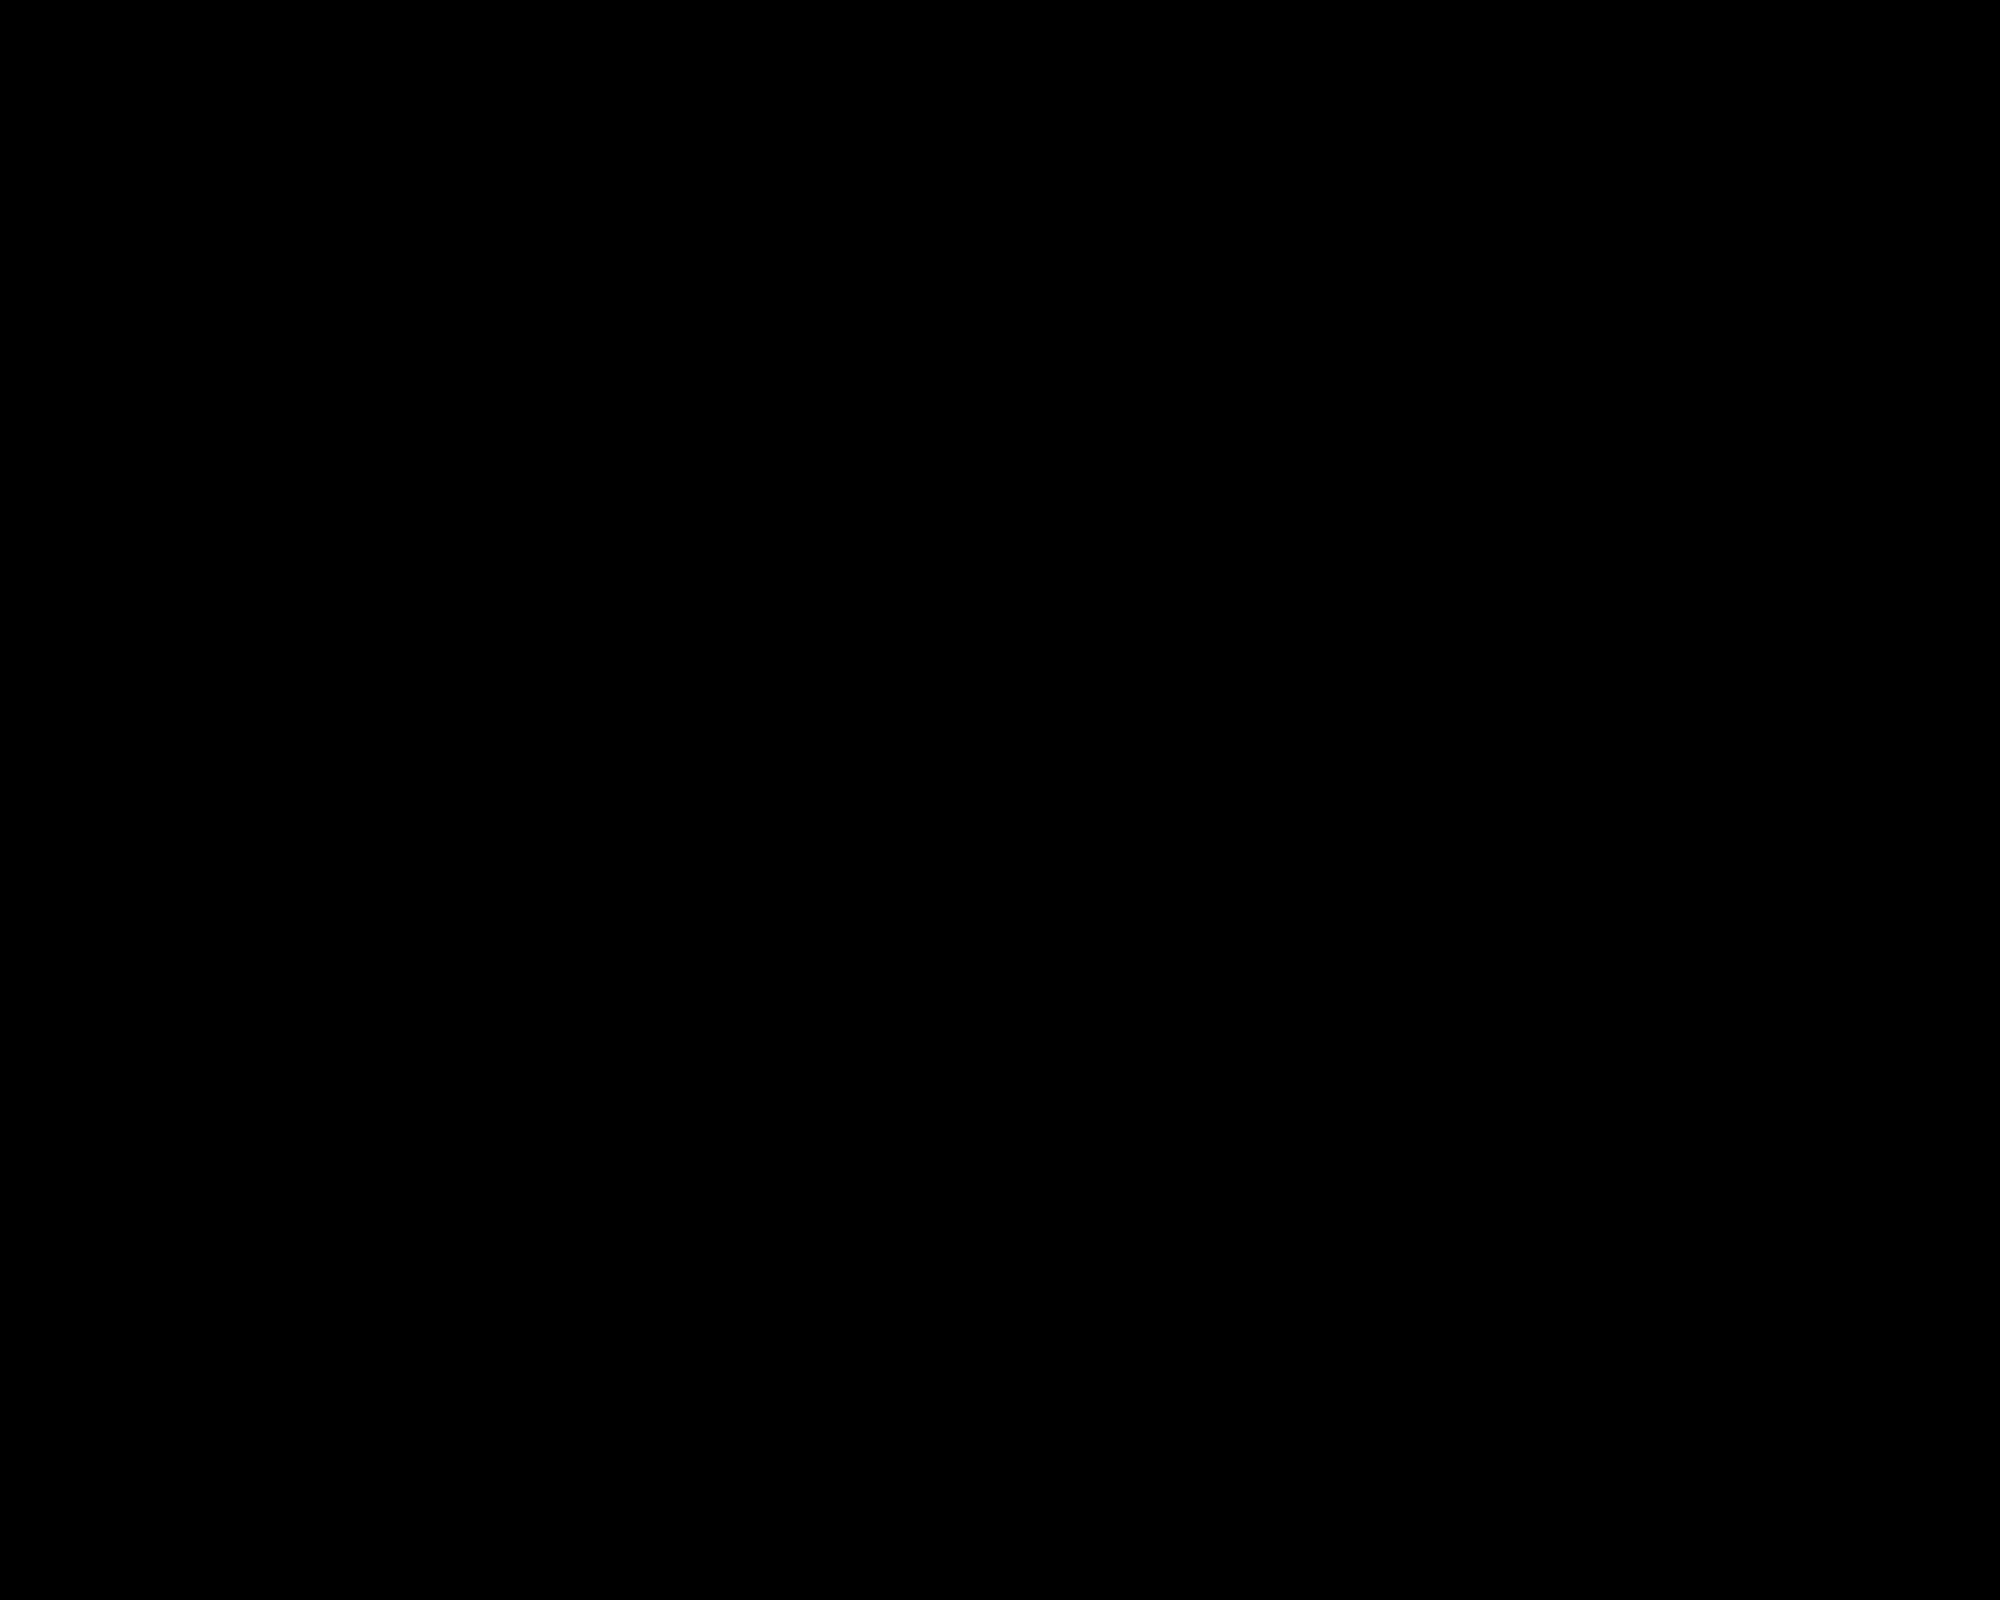 File logo svg wikimedia. Clipart bear brother bear